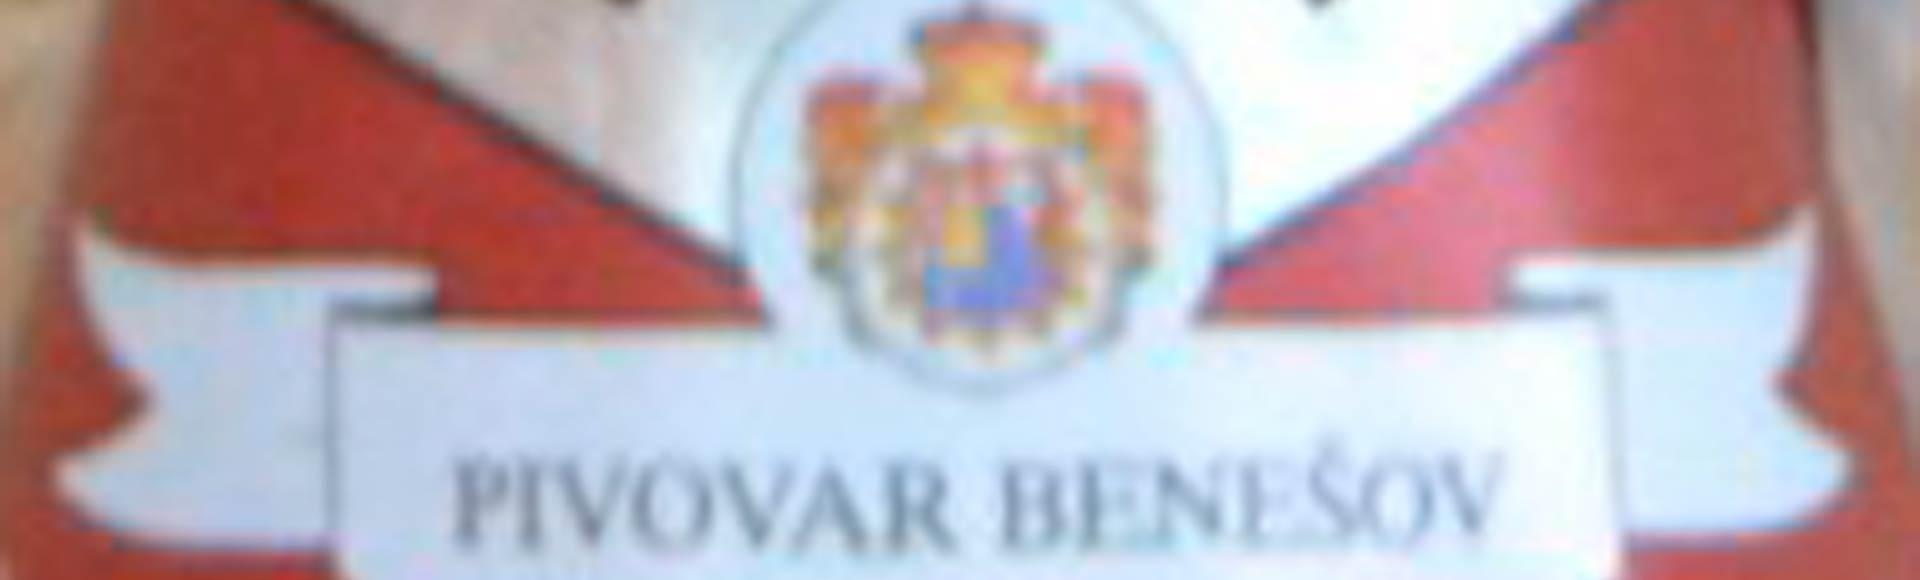 Sedm Kuli fra Pivovar Benesov